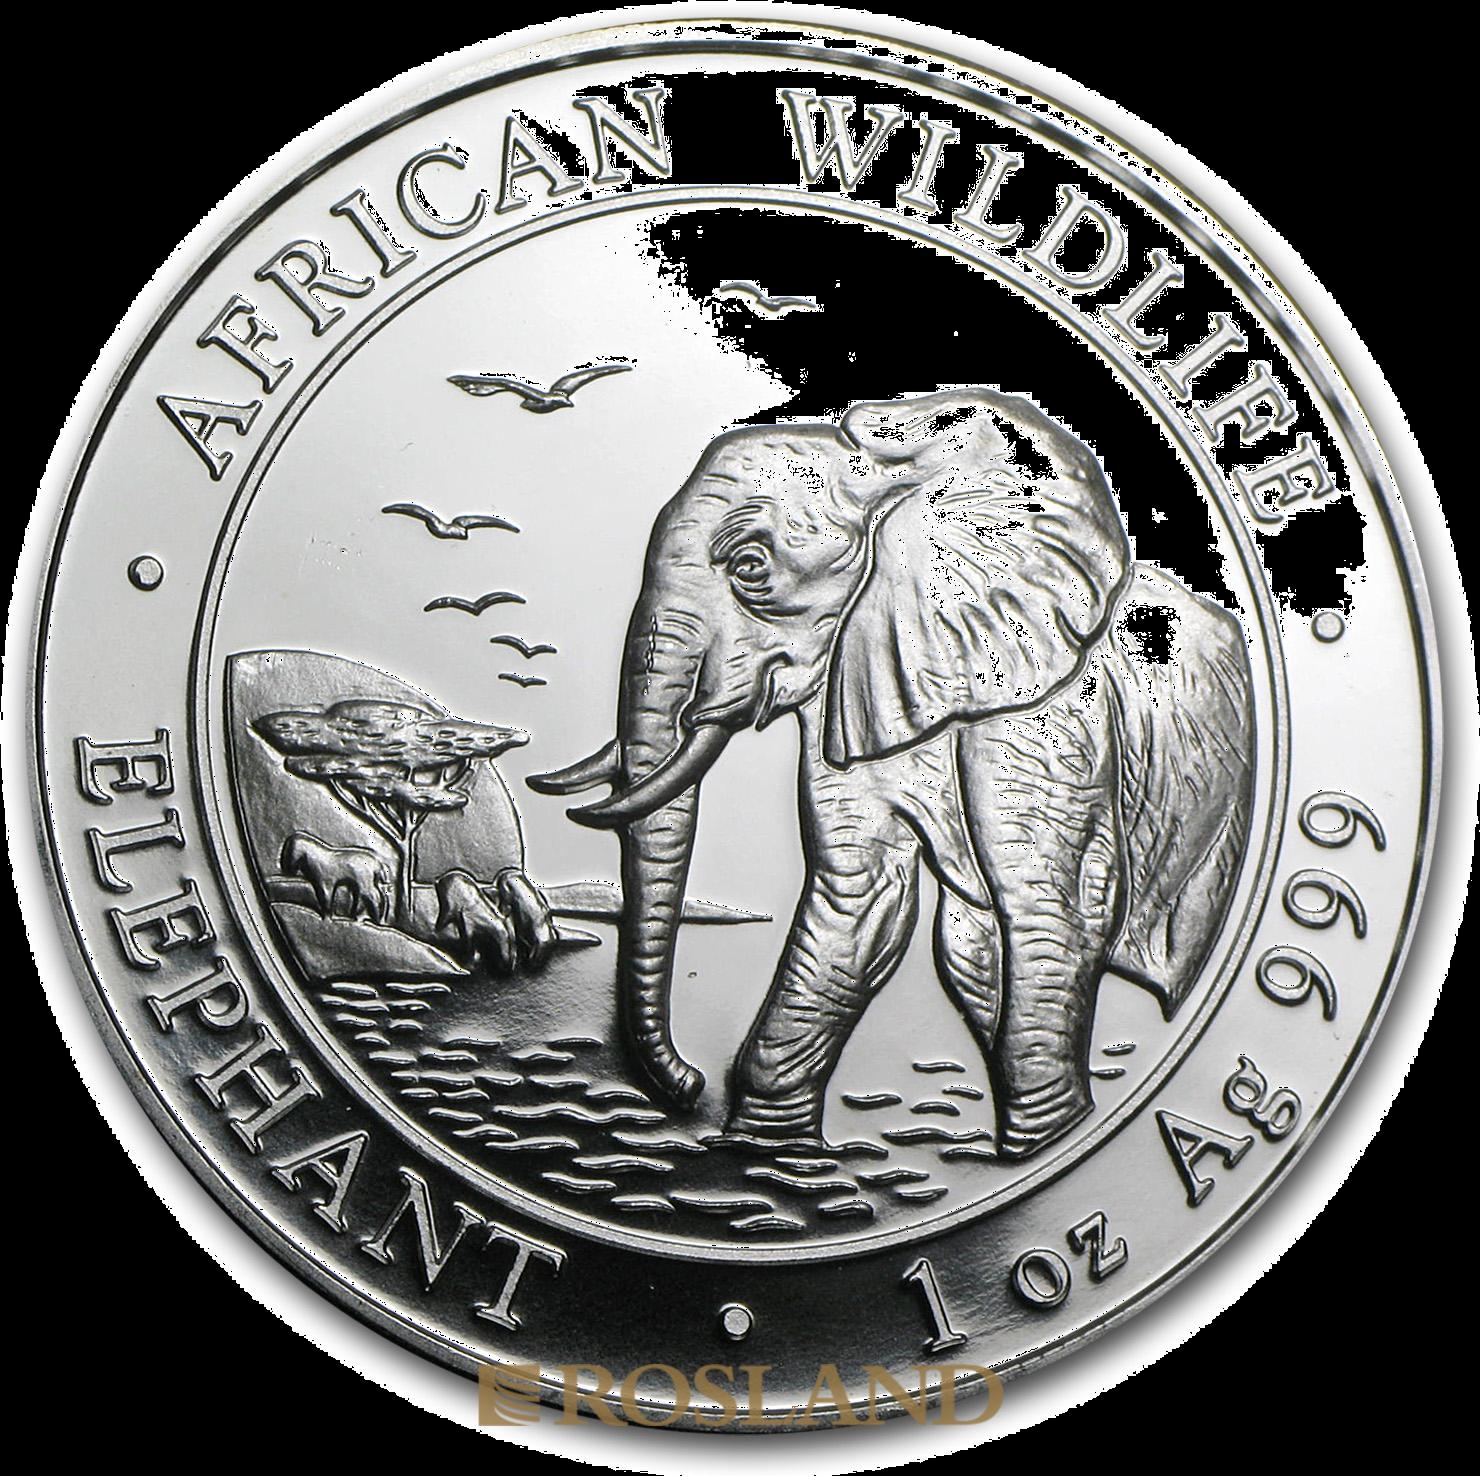 1 Unze Silbermünze Somalia Elefant 2010